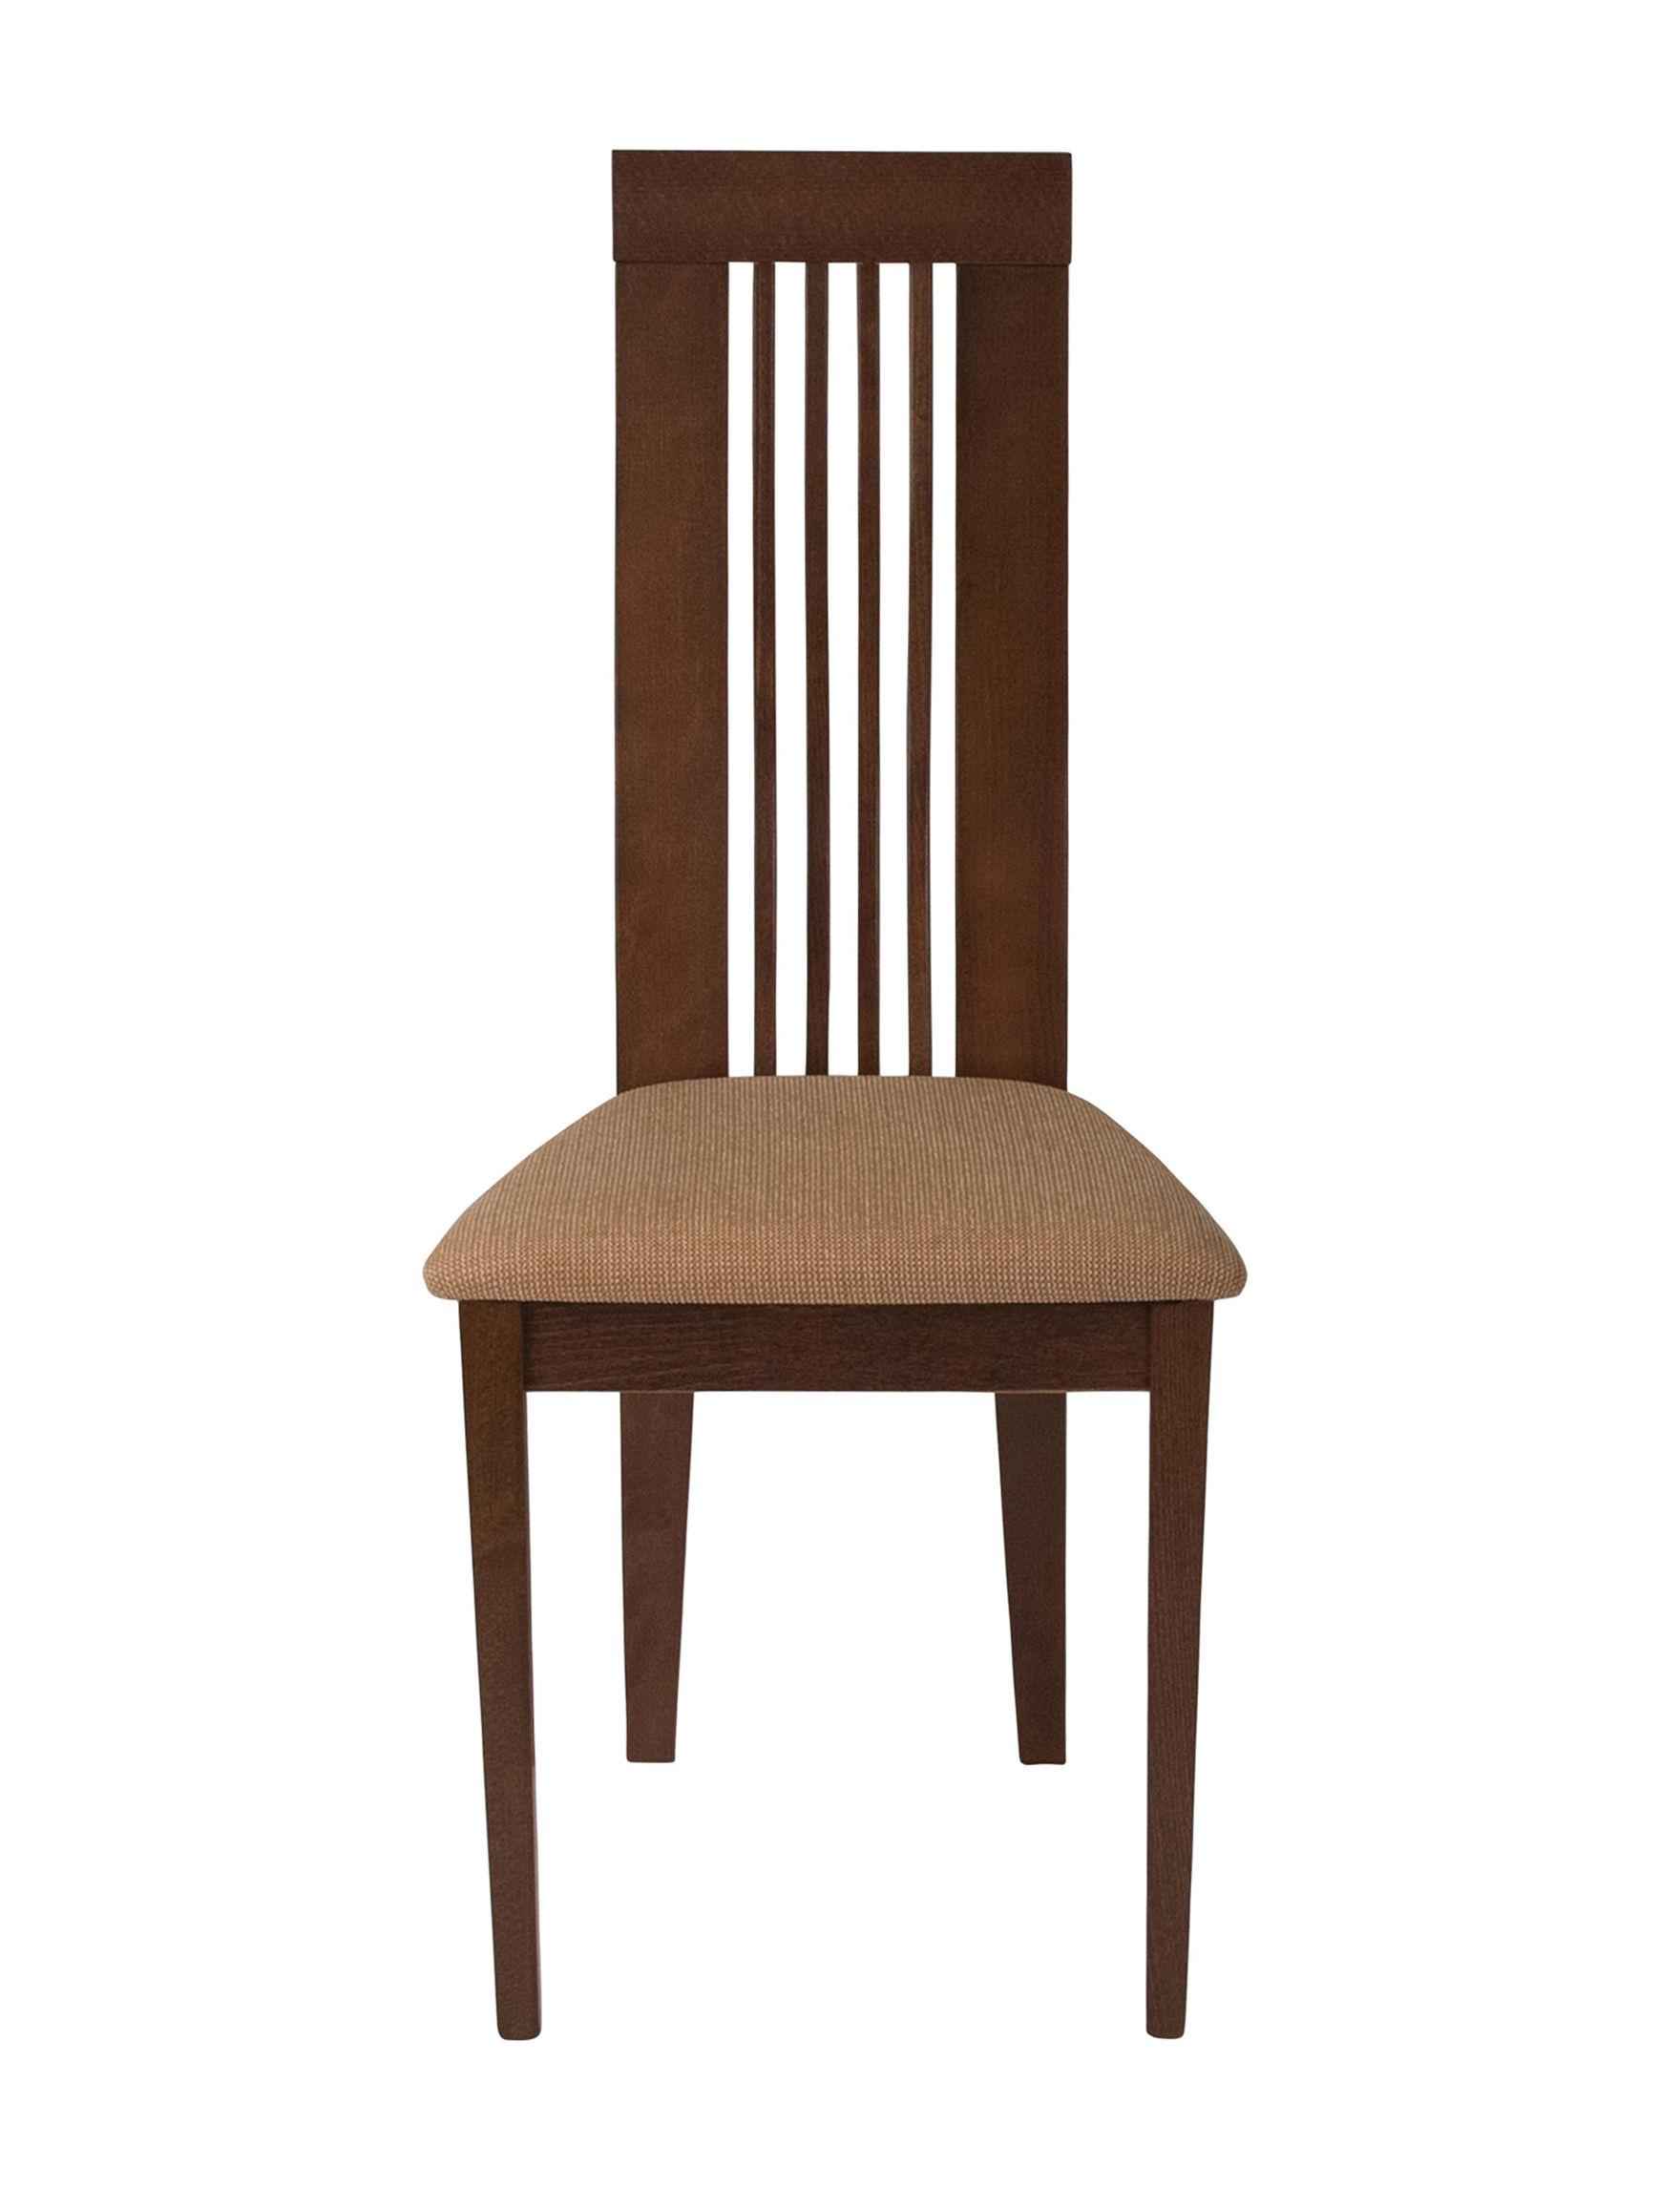 Flash Furniture Walnut Dining Chairs Kitchen & Dining Furniture